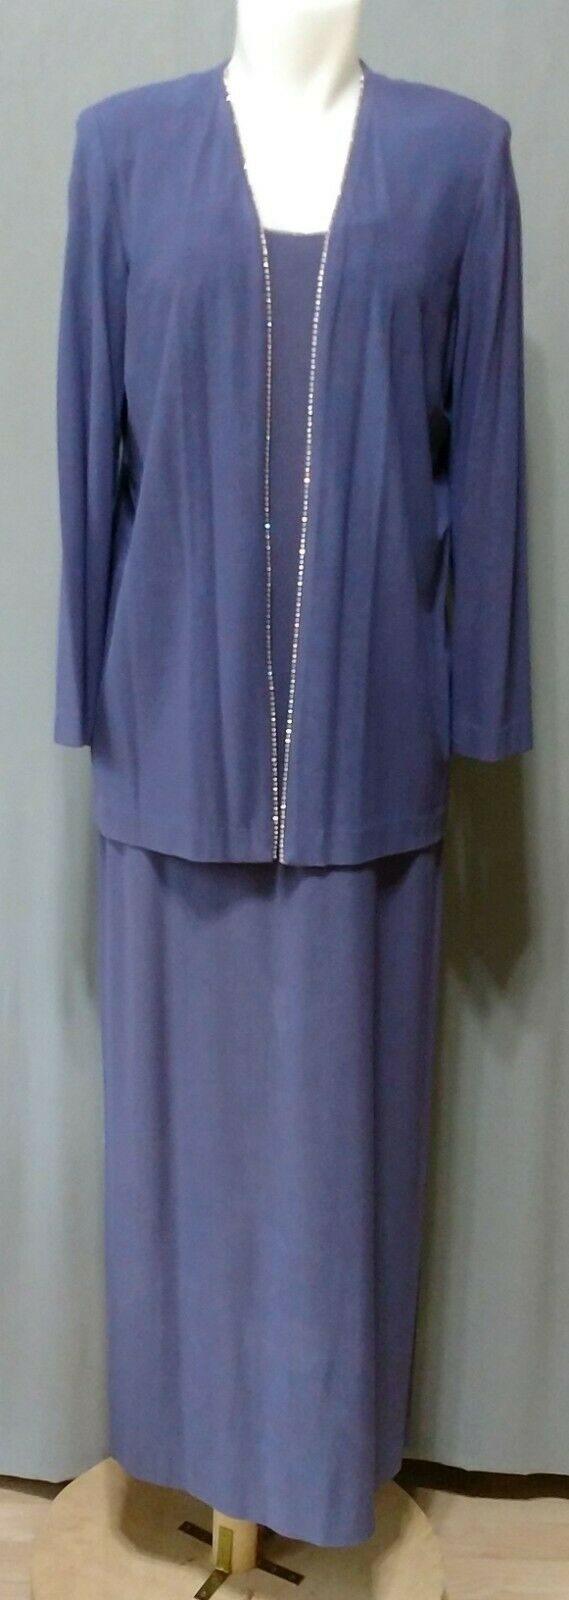 Alex Evenings - blue poly lycra spndx dress suit w lining - slvls dress - sz 14P